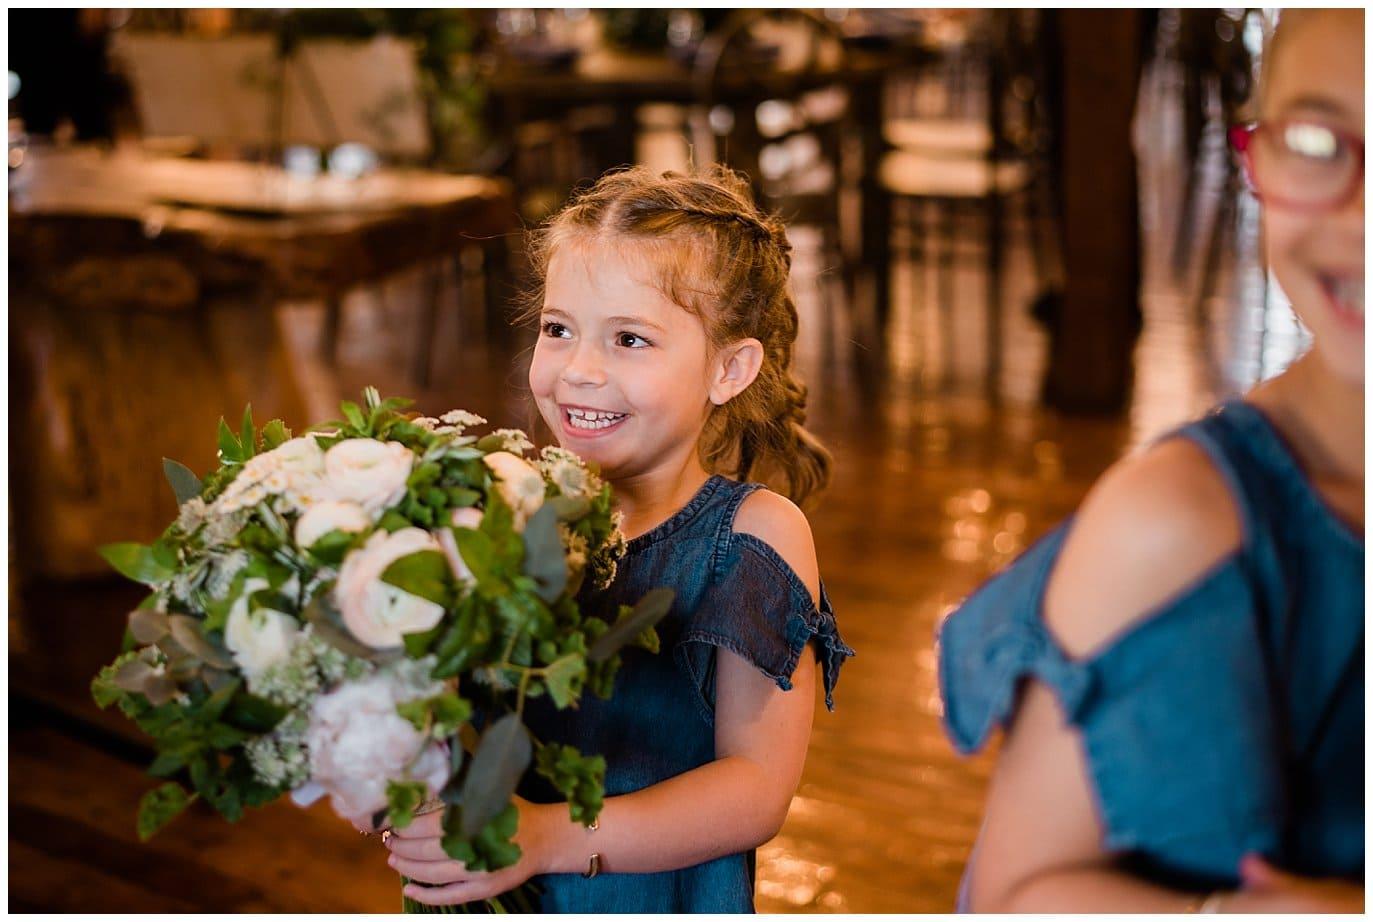 flower girl with bride's flower at Deer Creek Valley Ranch wedding by Denver Wedding Photographer Jennie Crate Photographer